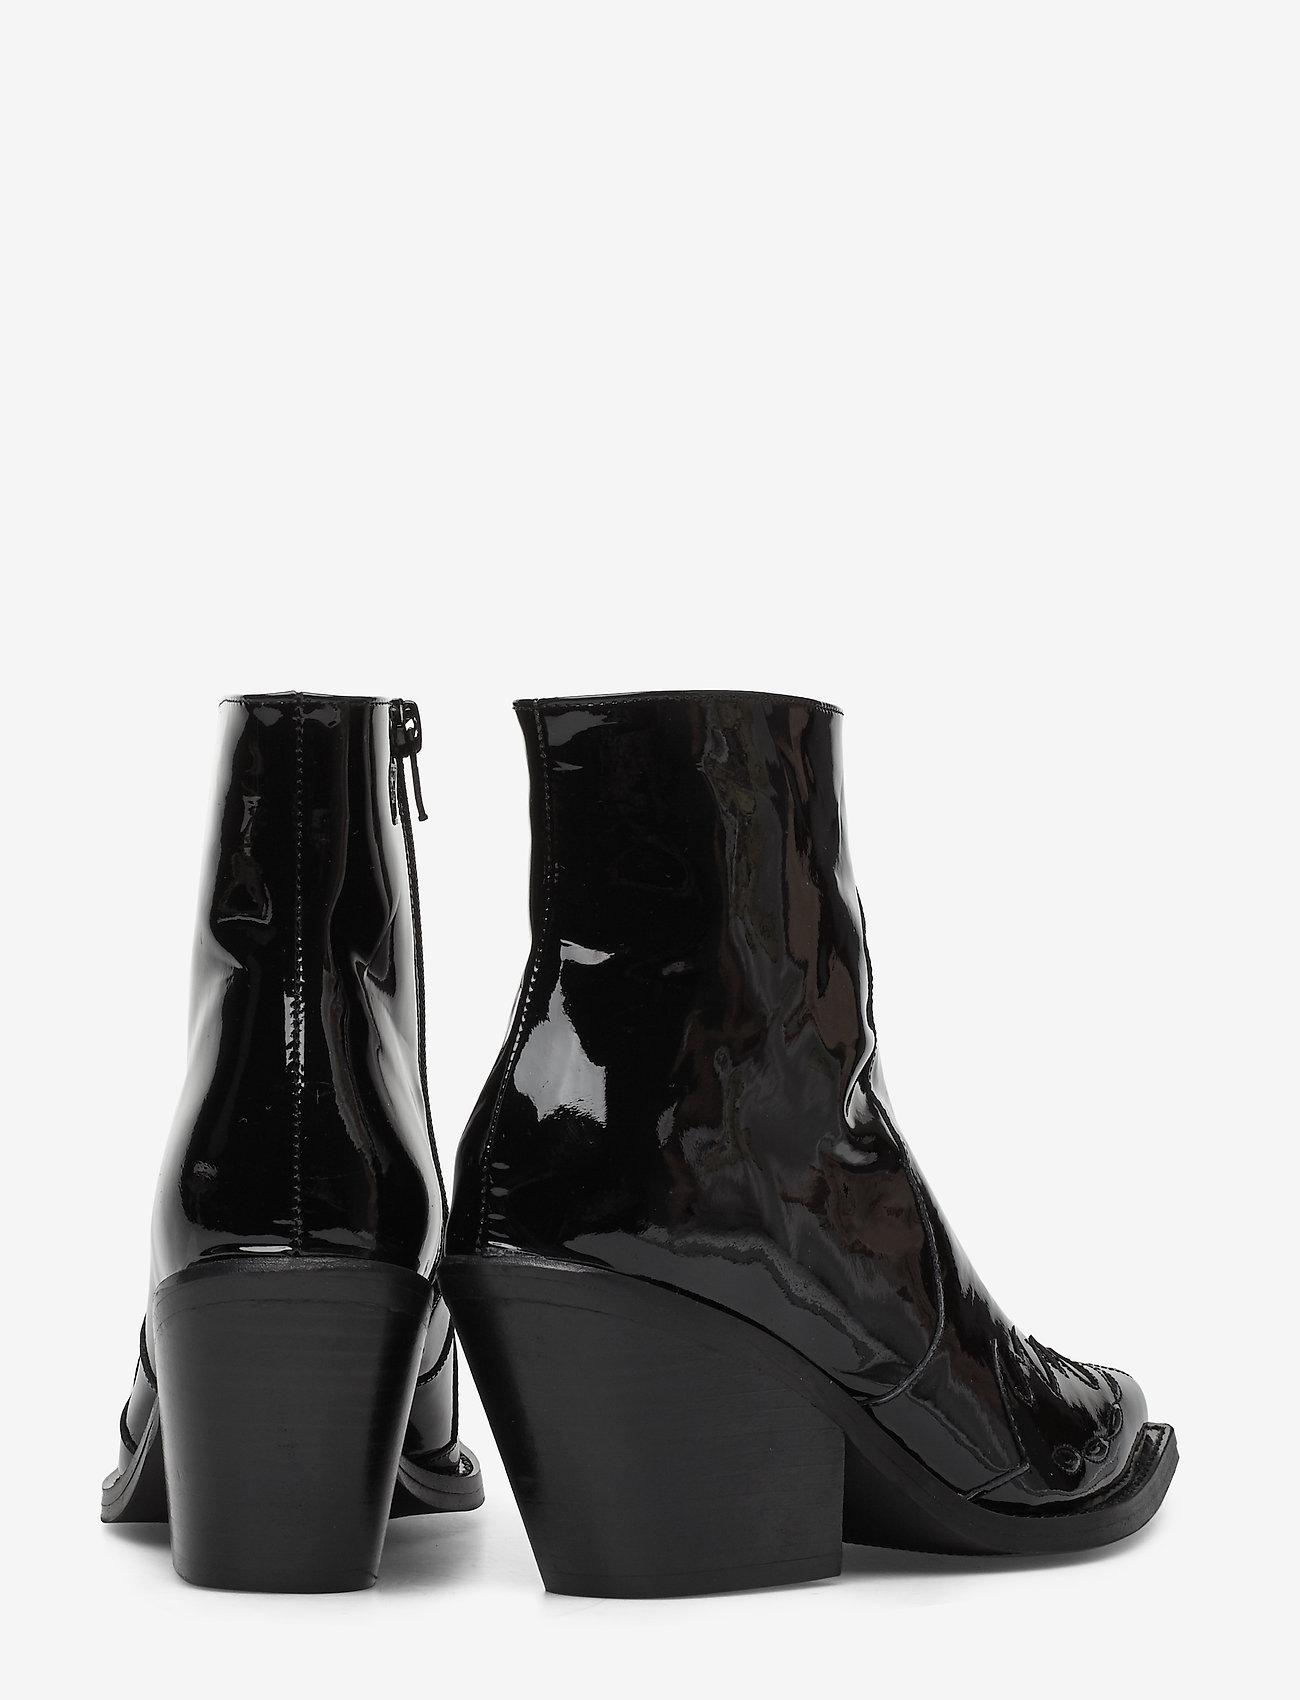 Lynn Patent Black (Black) - Henry Kole